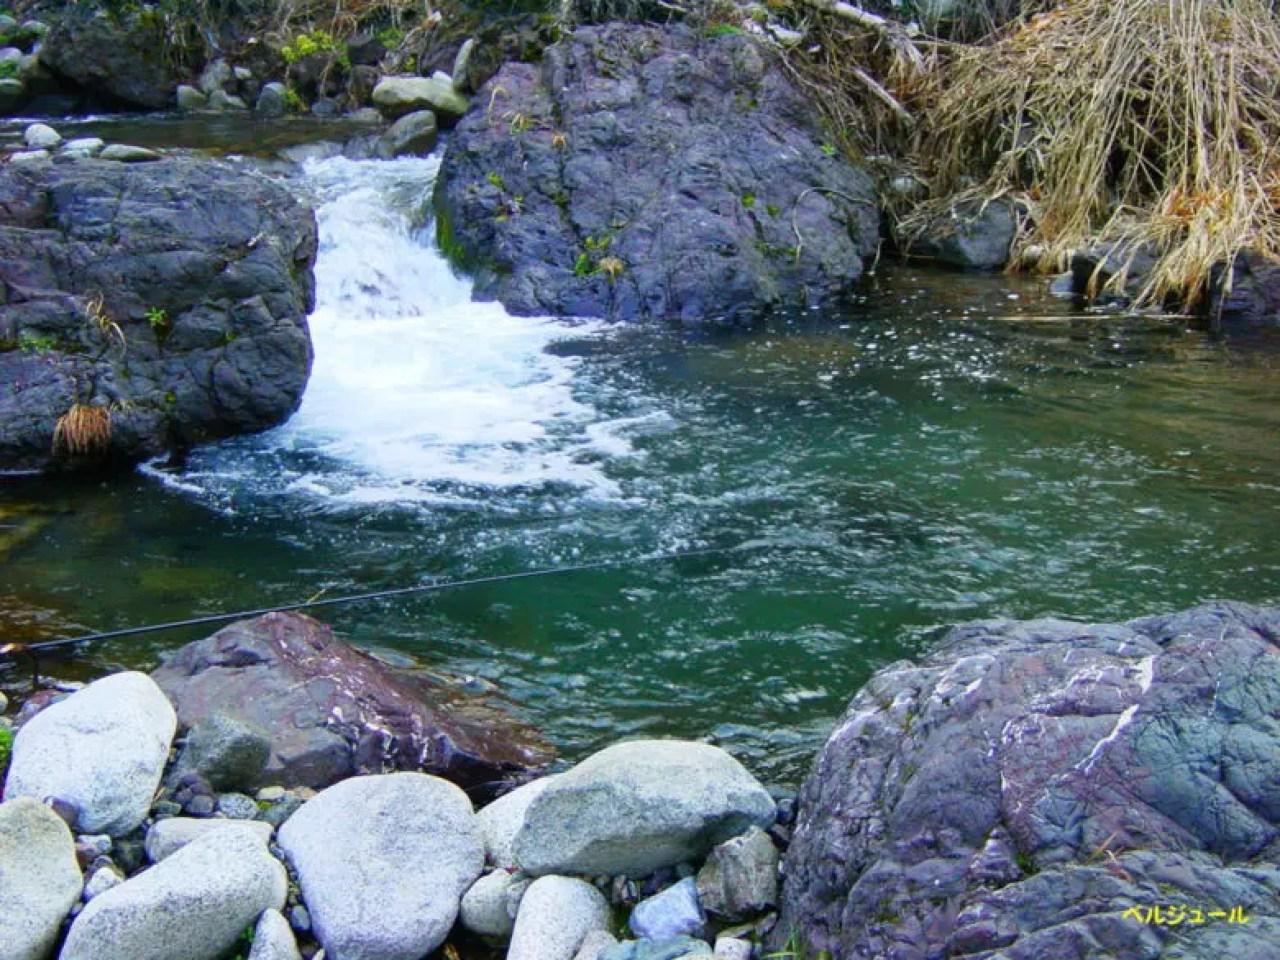 tokuyama00001 - 揖斐川上流・旧徳山村での岩魚釣り